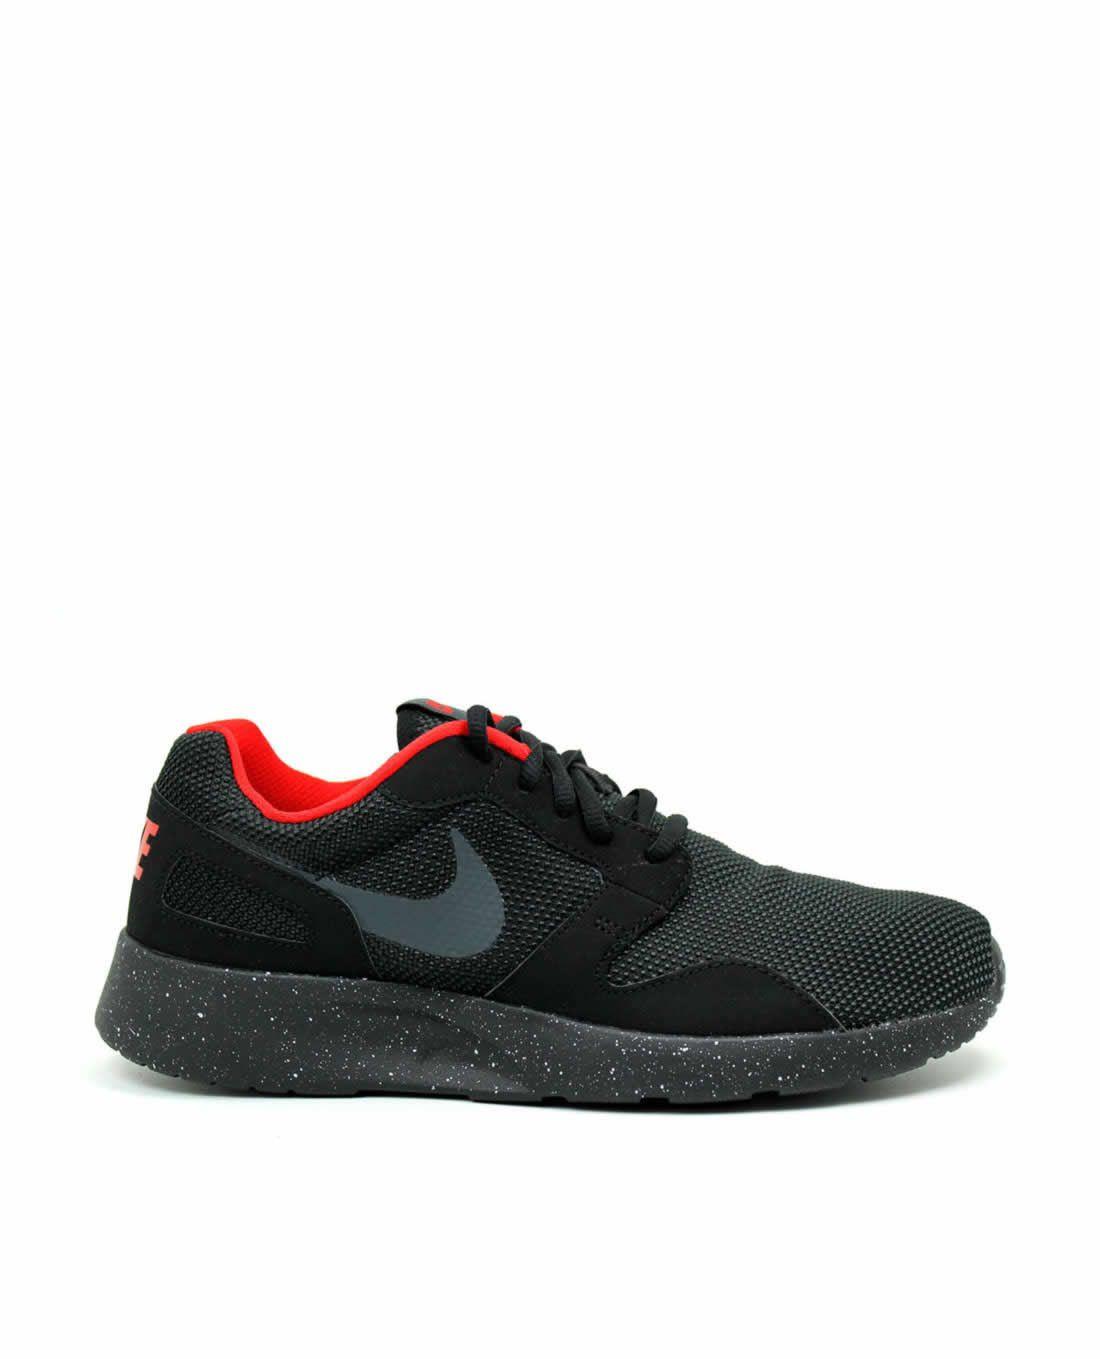 sports shoes 8e28b 3ec6d Zapatillas NIKE KAISHI WINTER negro 807405